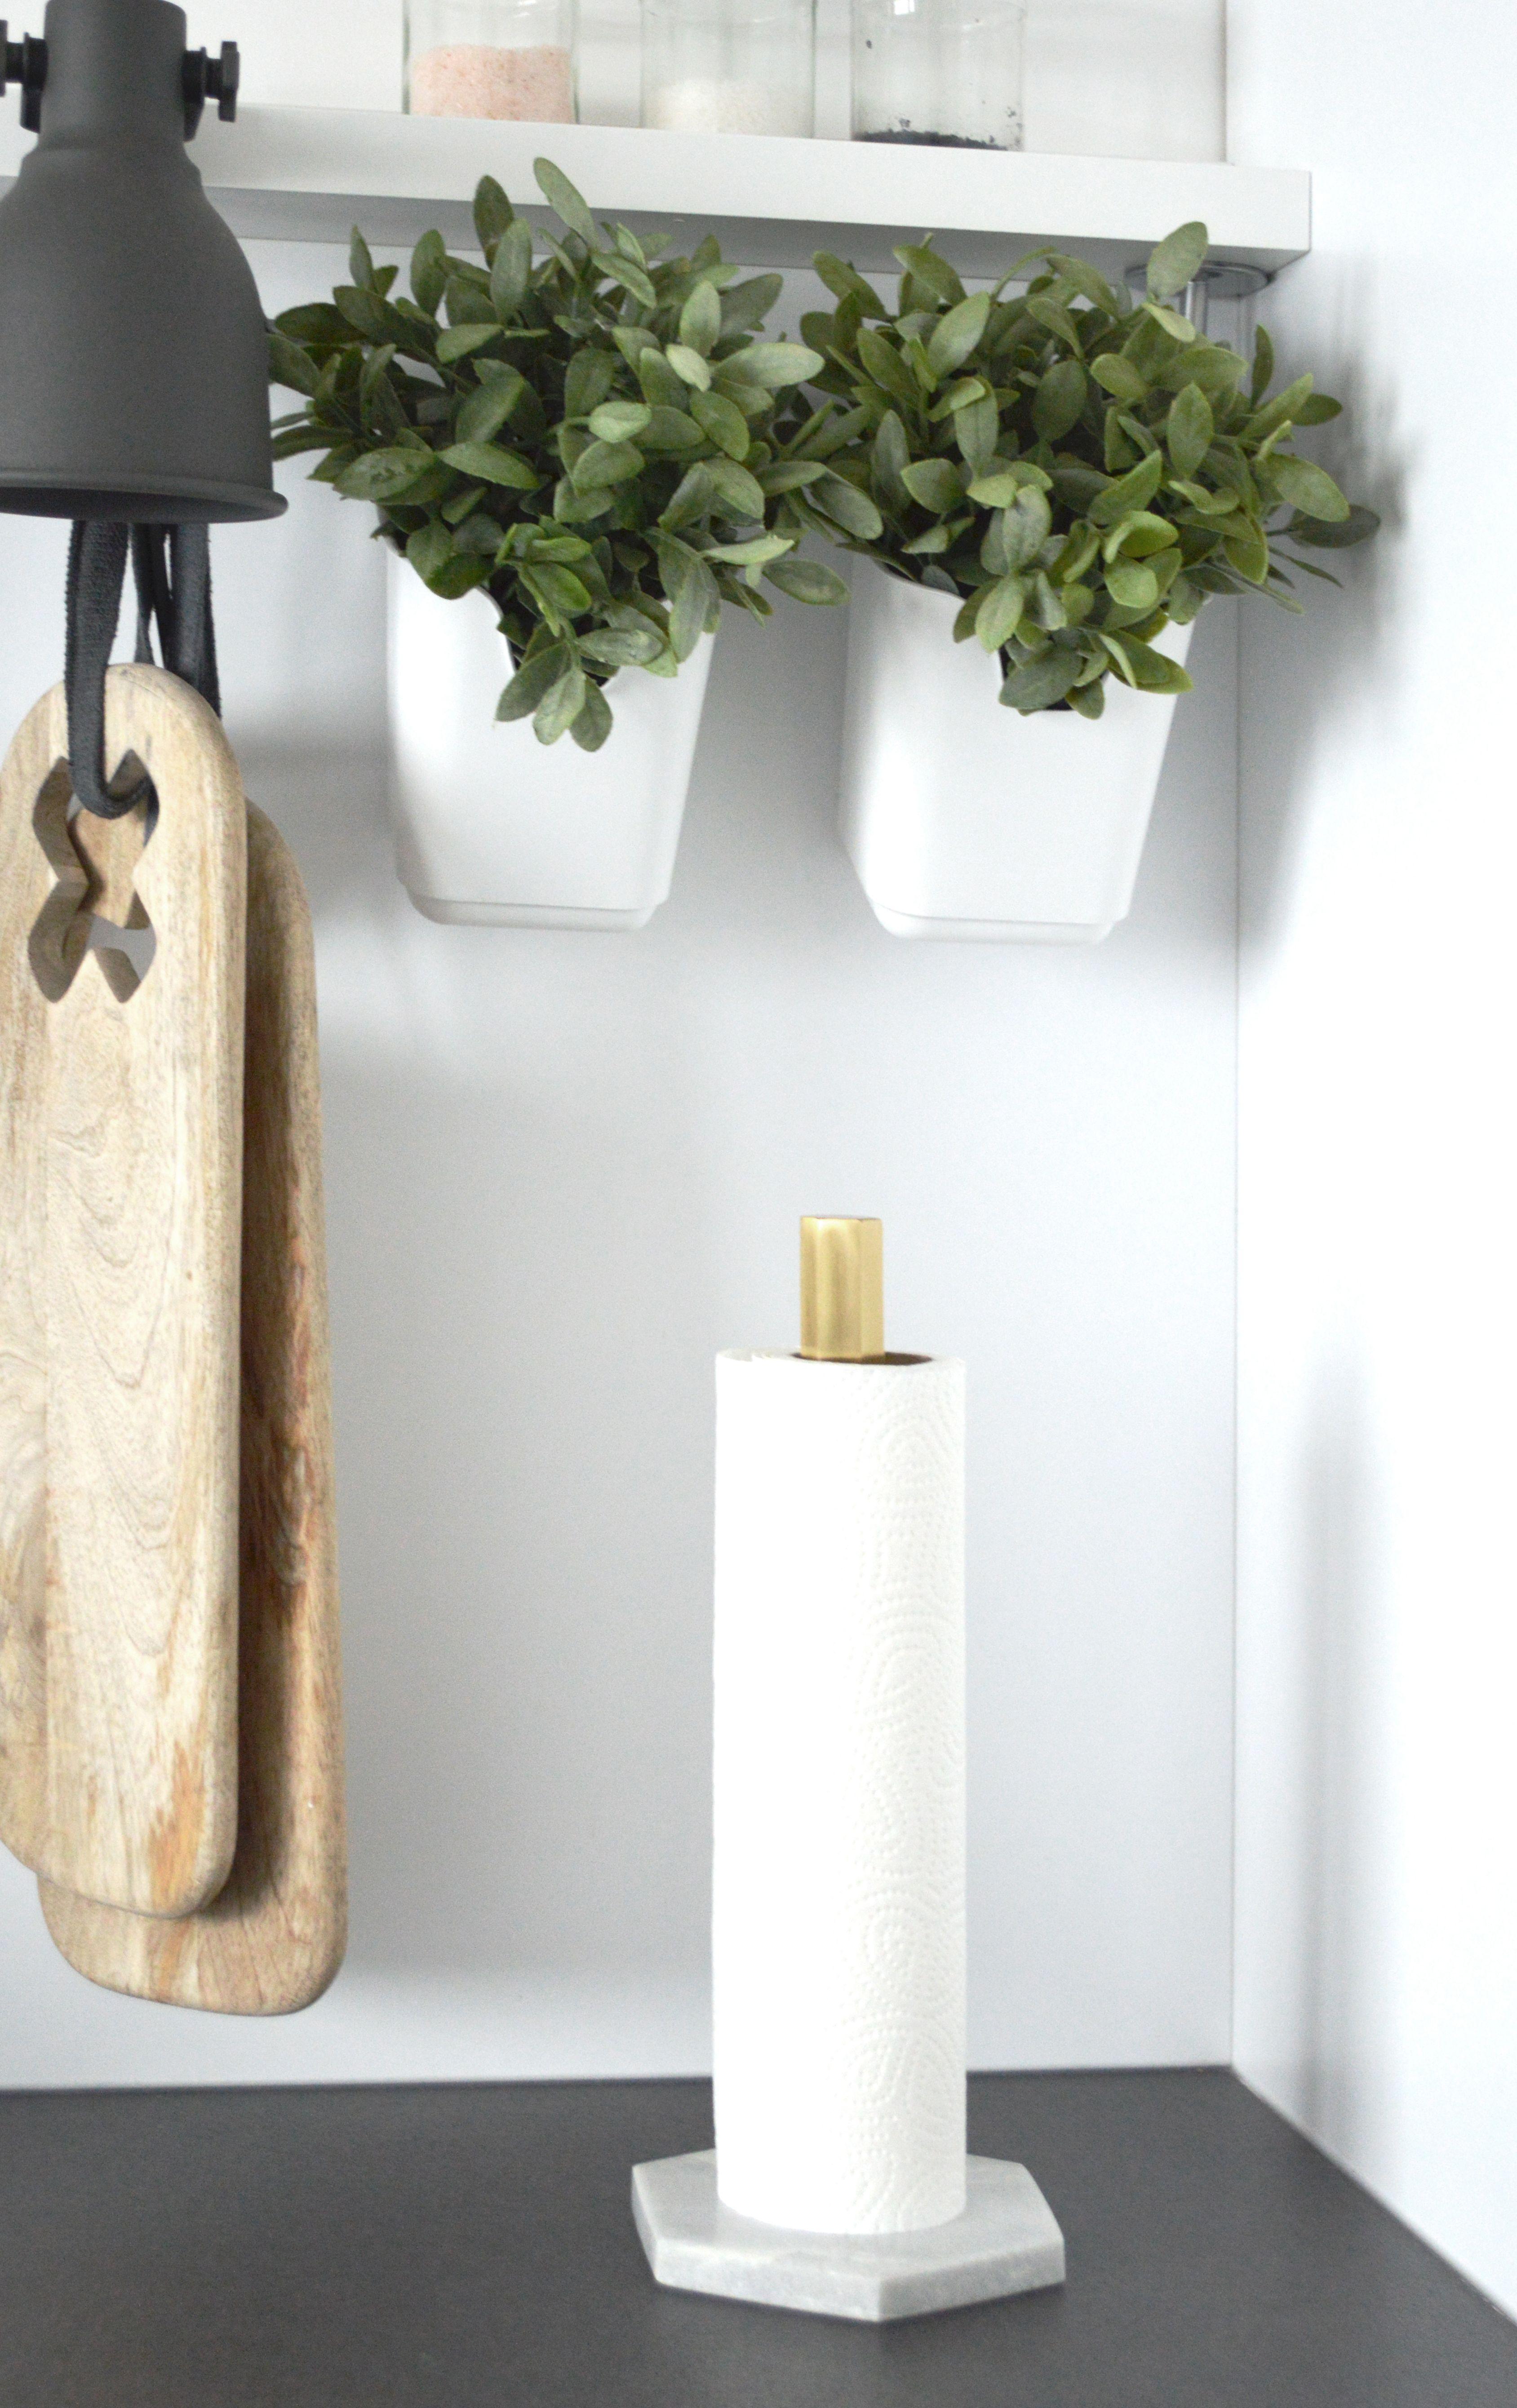 ferm Living - Hexagon Küchenrollenhalter | Küchenrollenhalter ...